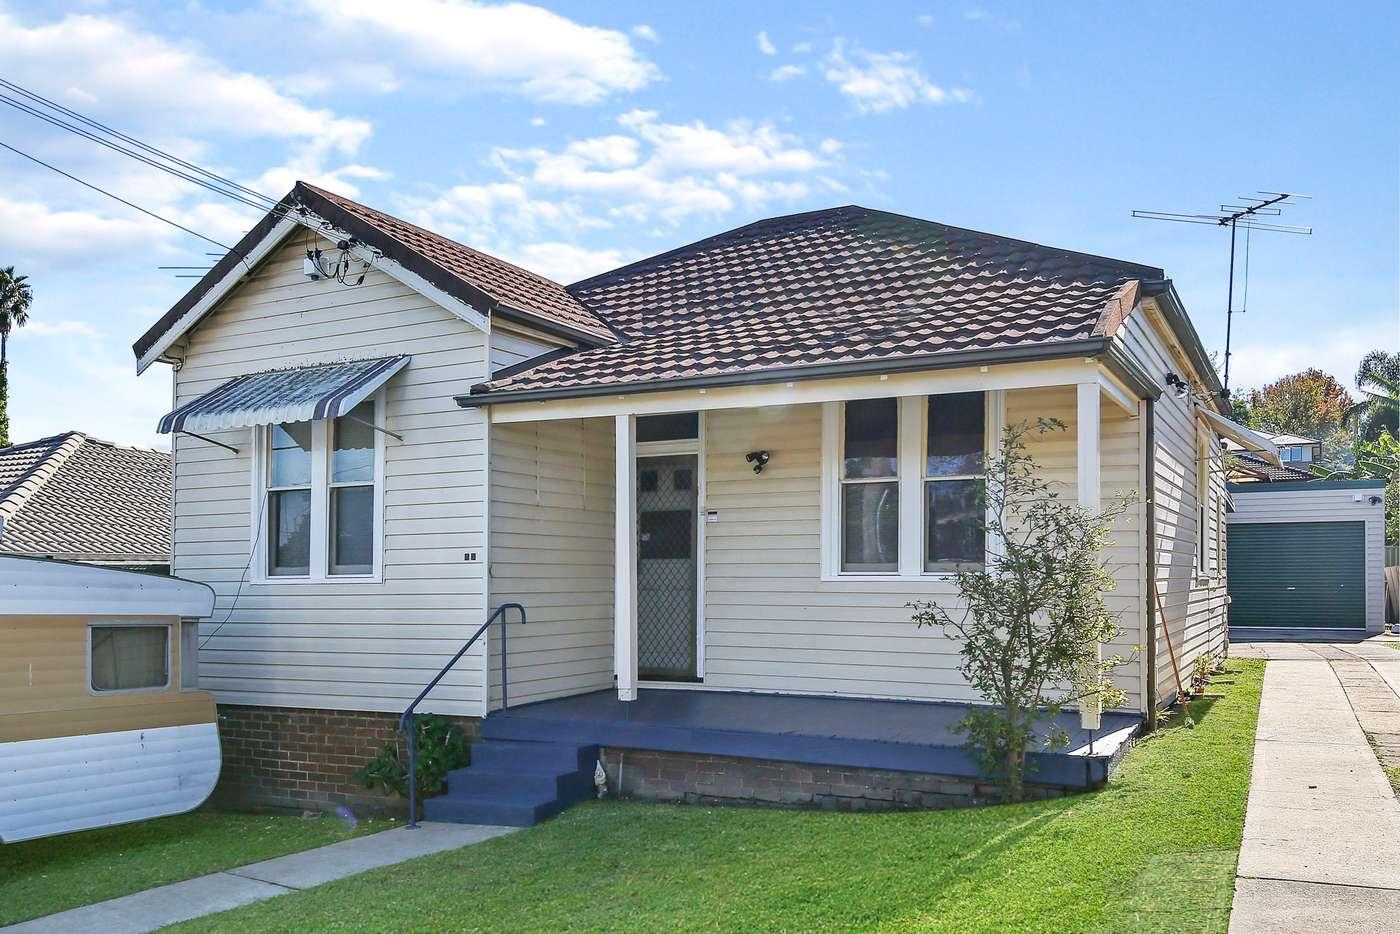 Main view of Homely house listing, 75 Cornelia Road, Toongabbie NSW 2146